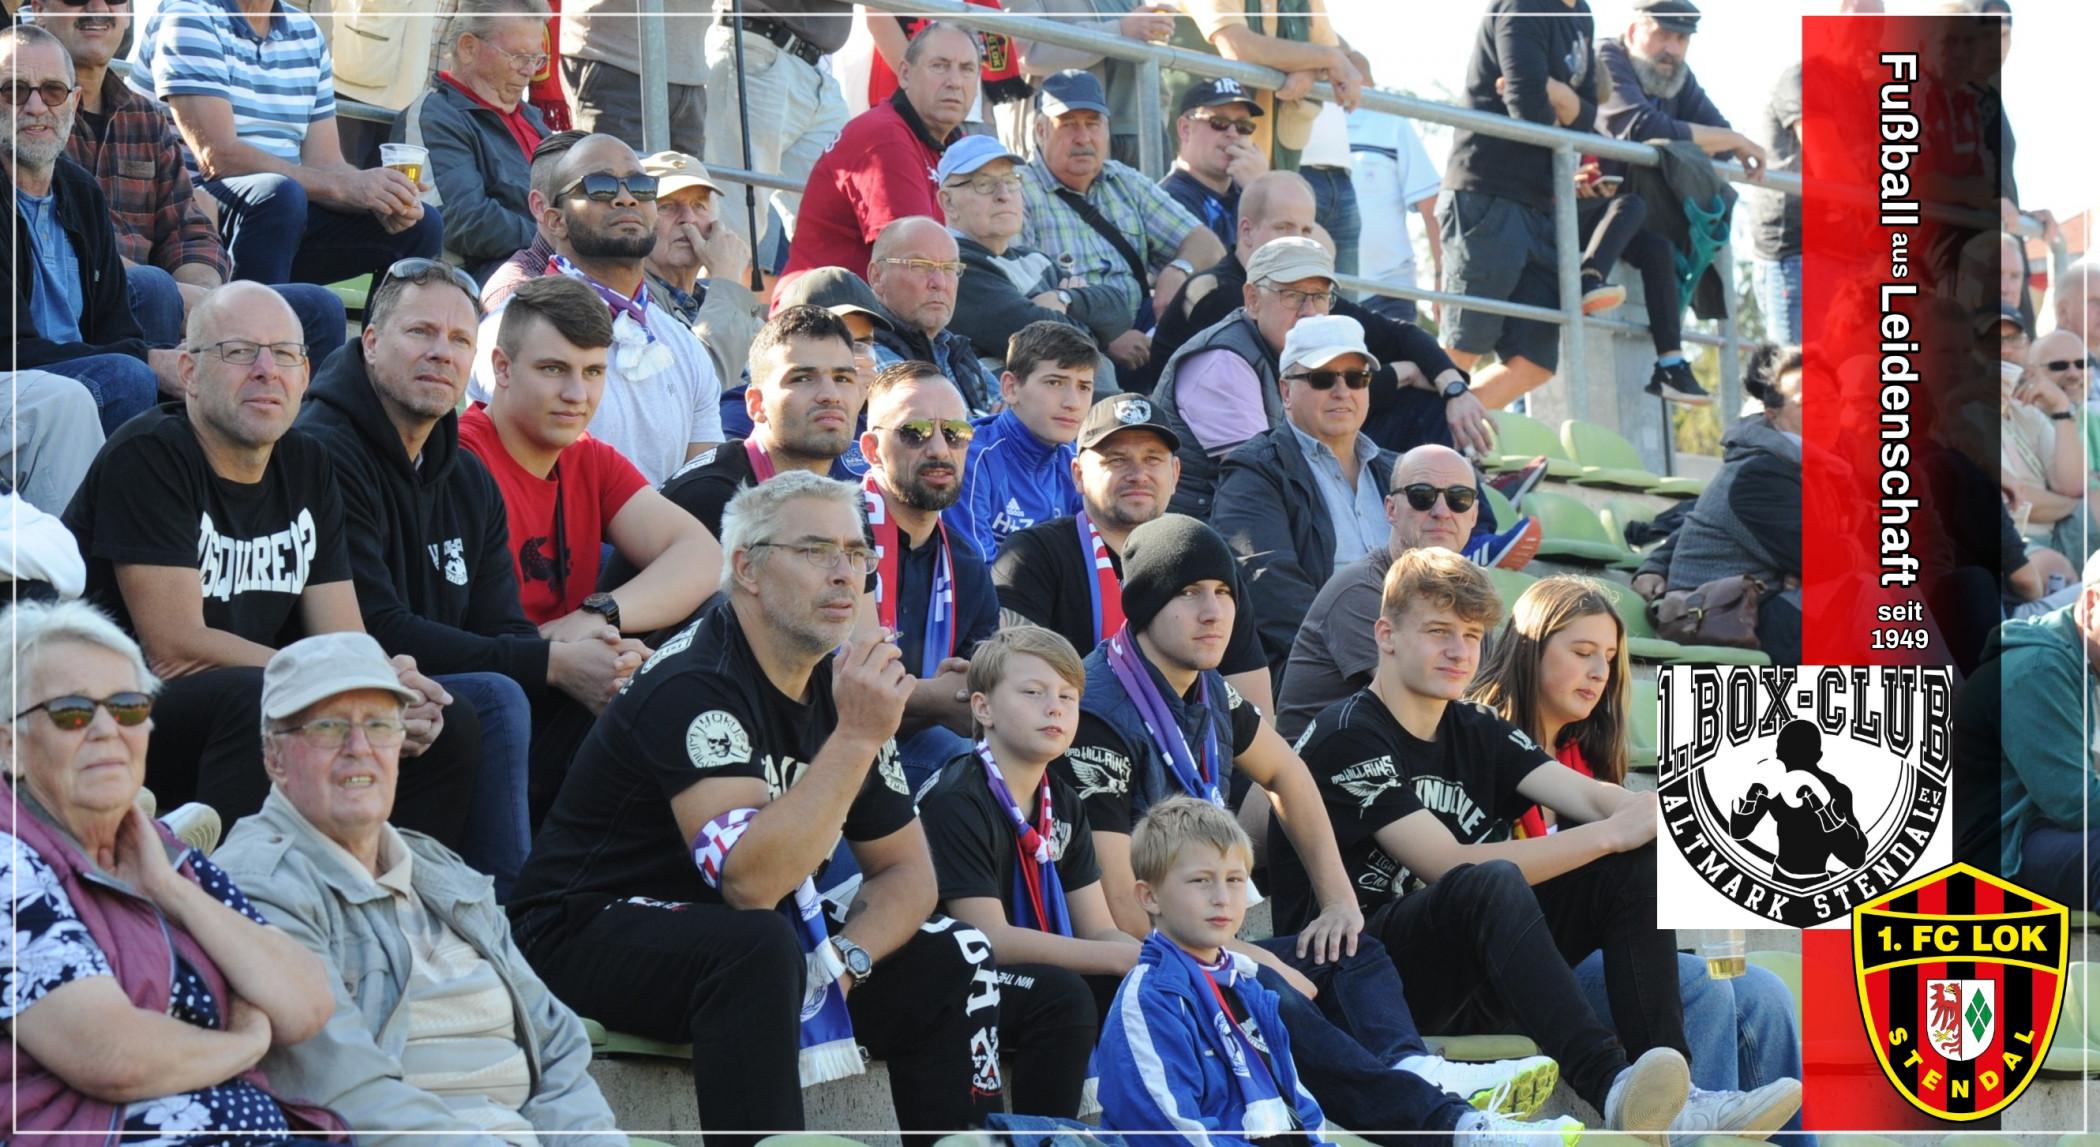 #Sportverbindet - 1. FC Lok Stendal